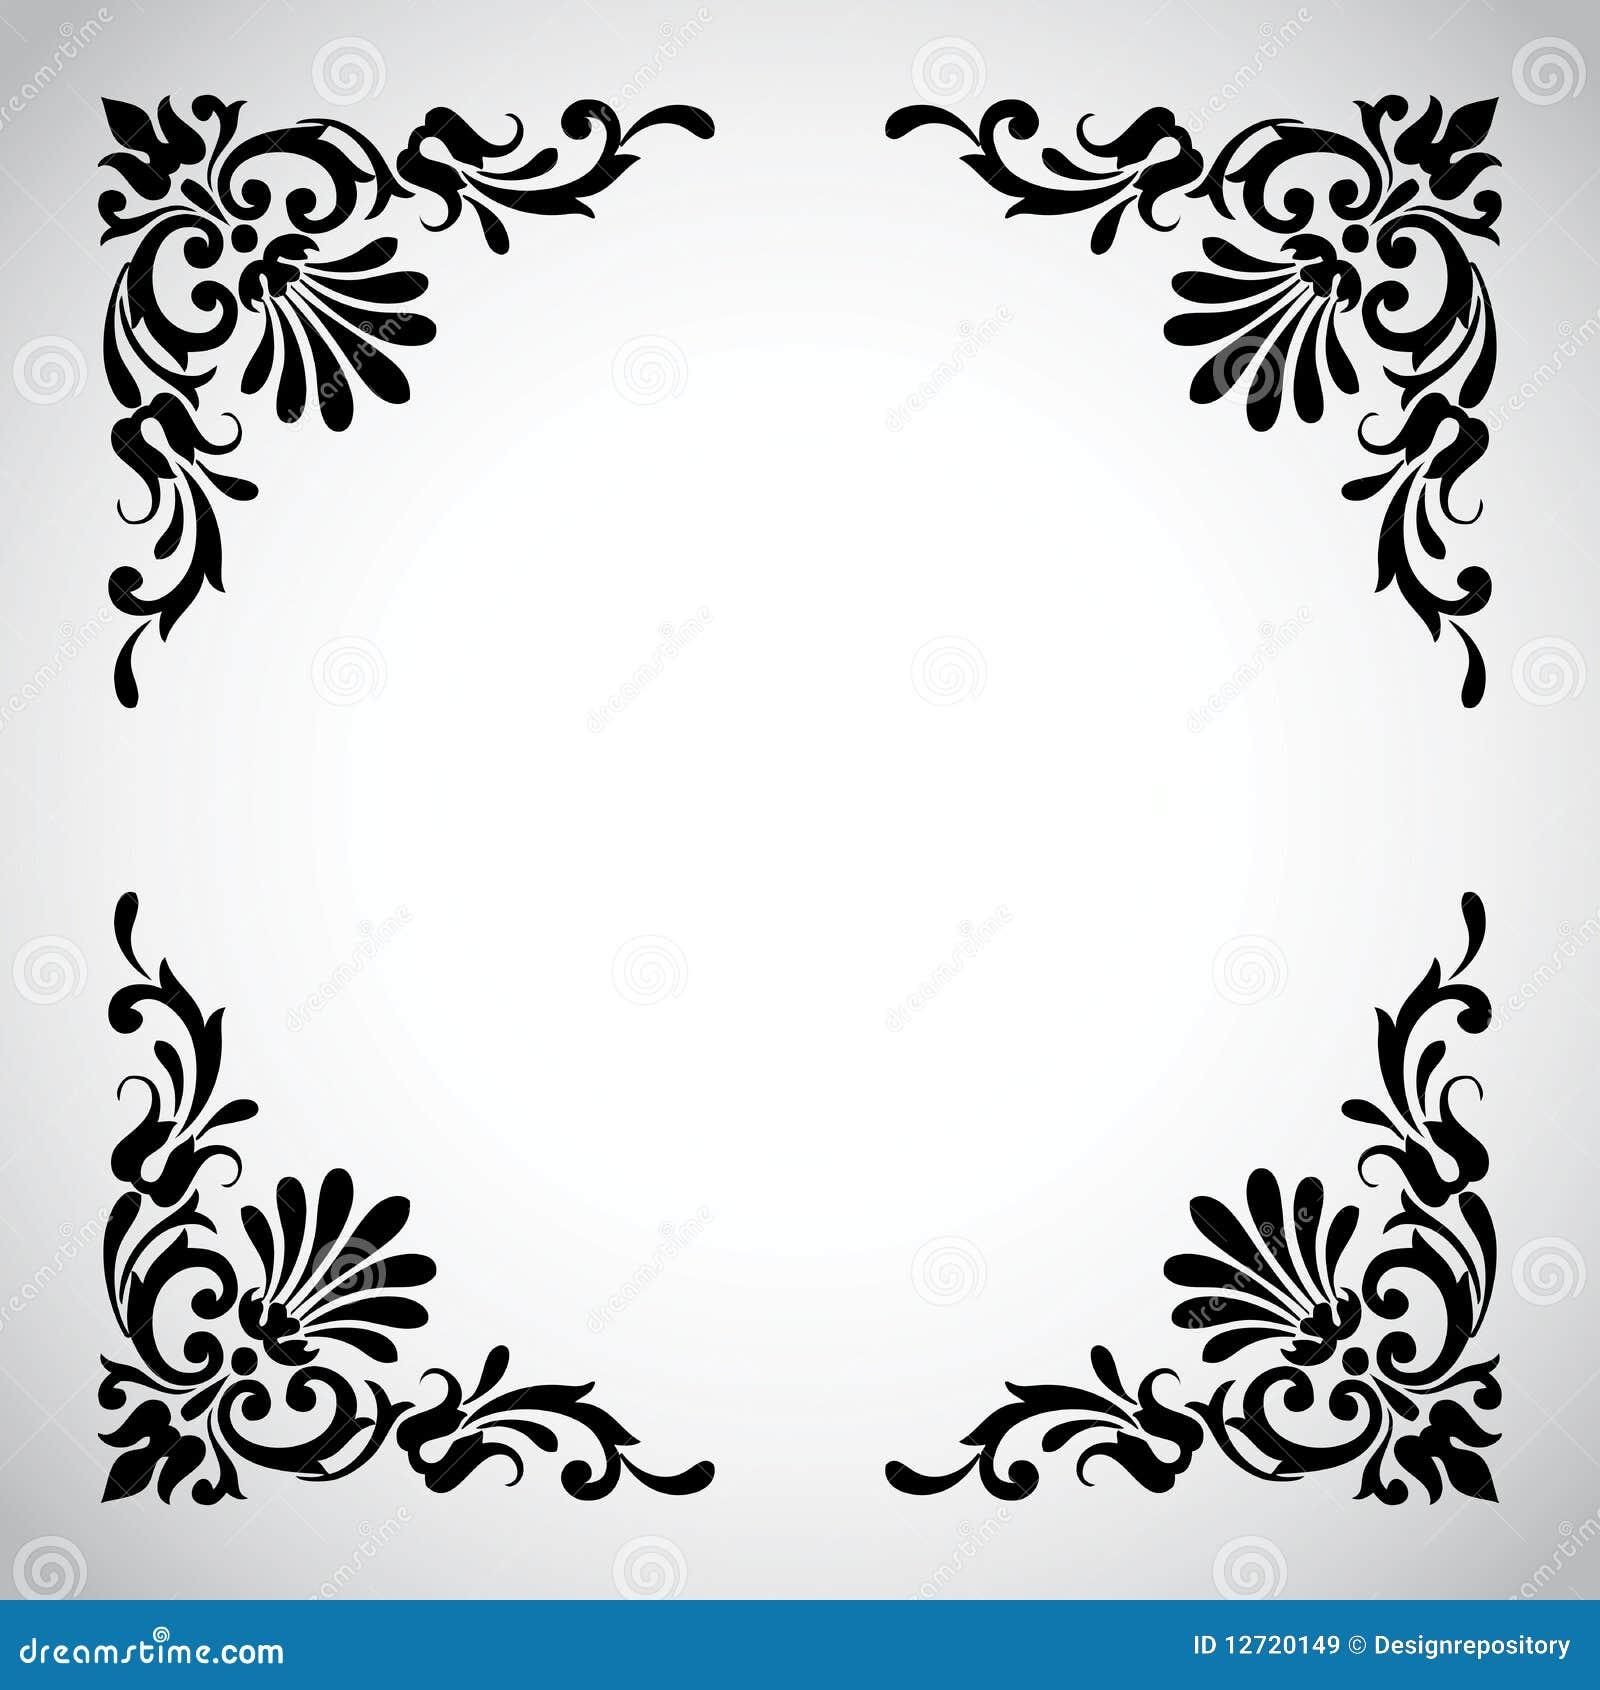 decorative designs wwwpixsharkcom images galleries